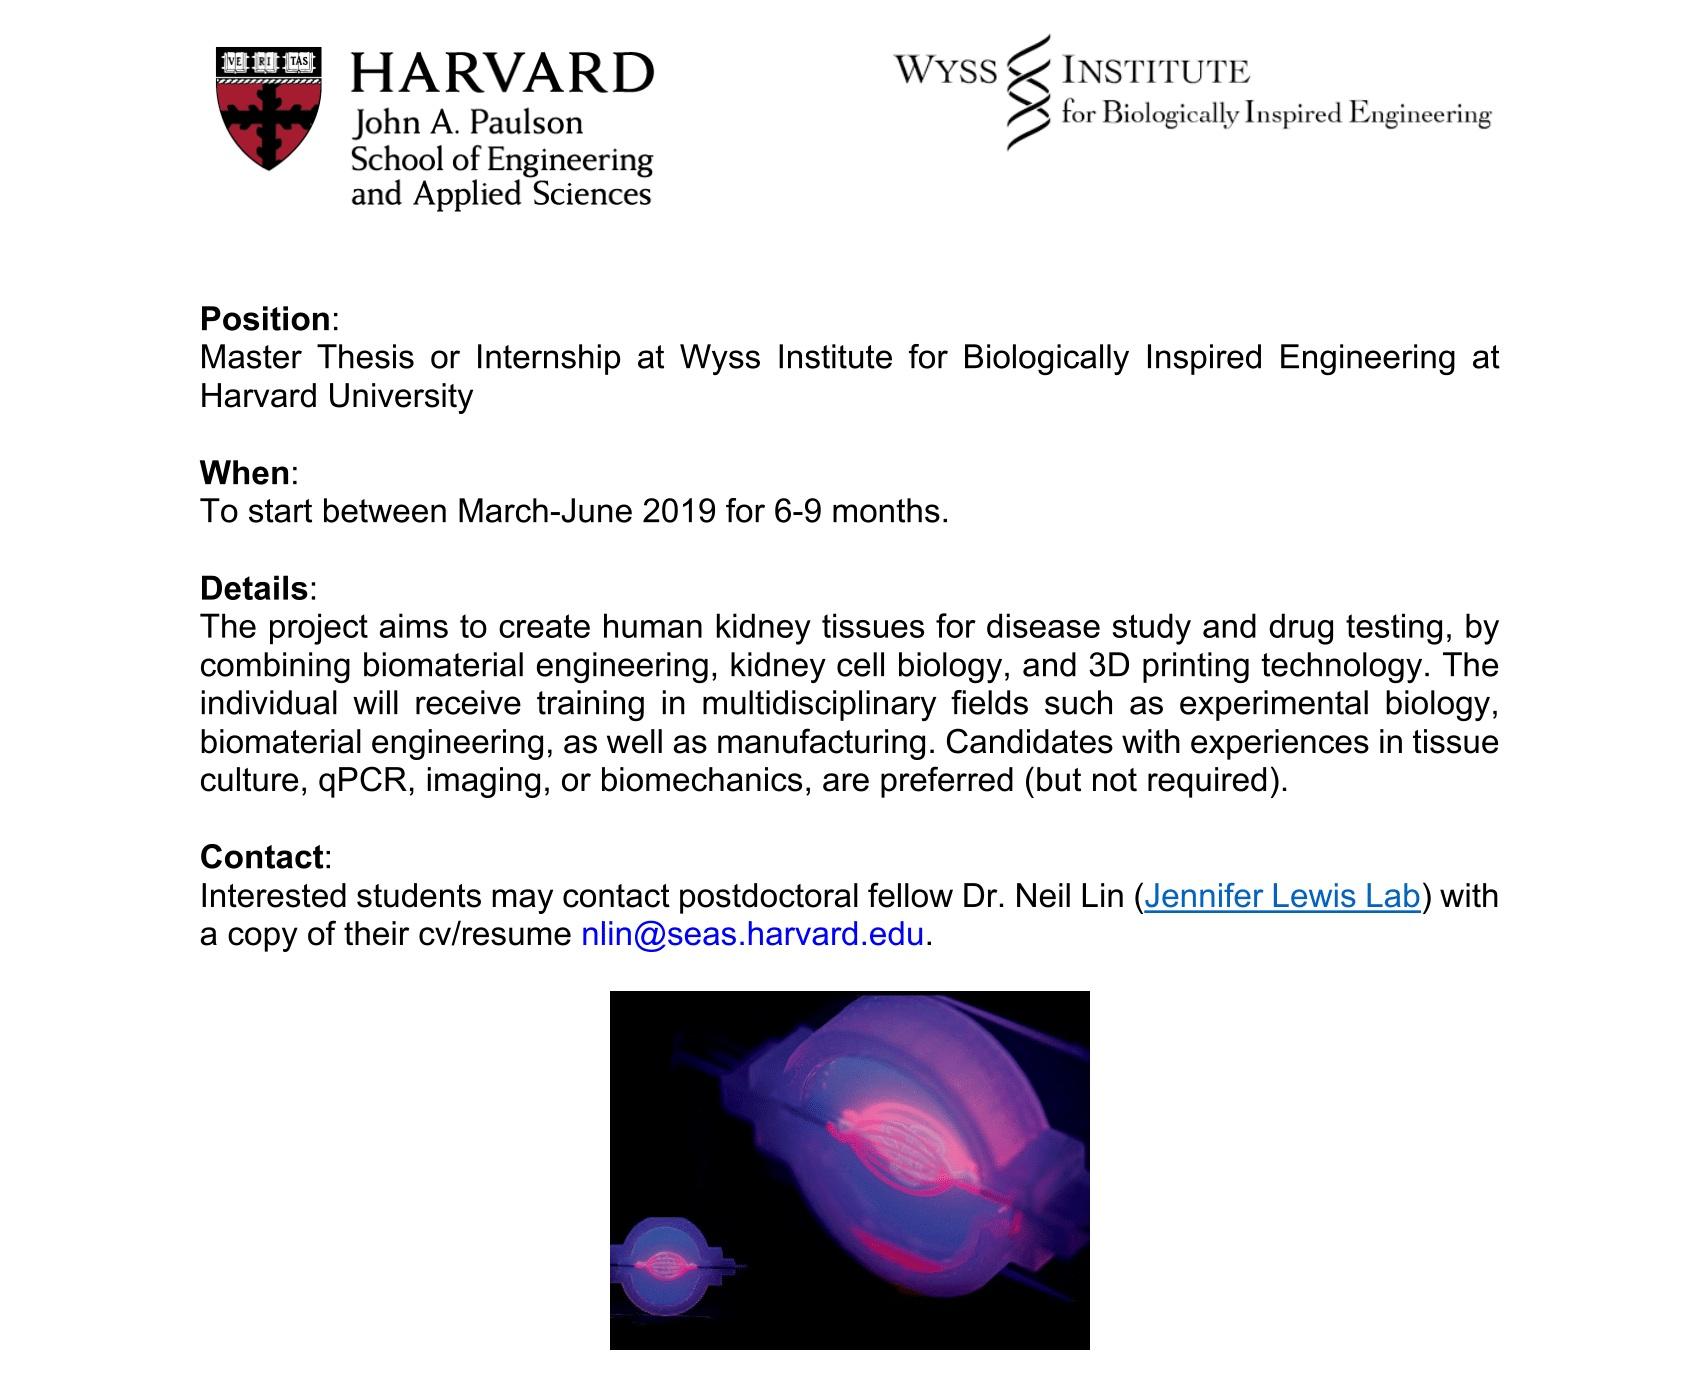 Harvard20University20Master20Student+%281%29-1.jpg